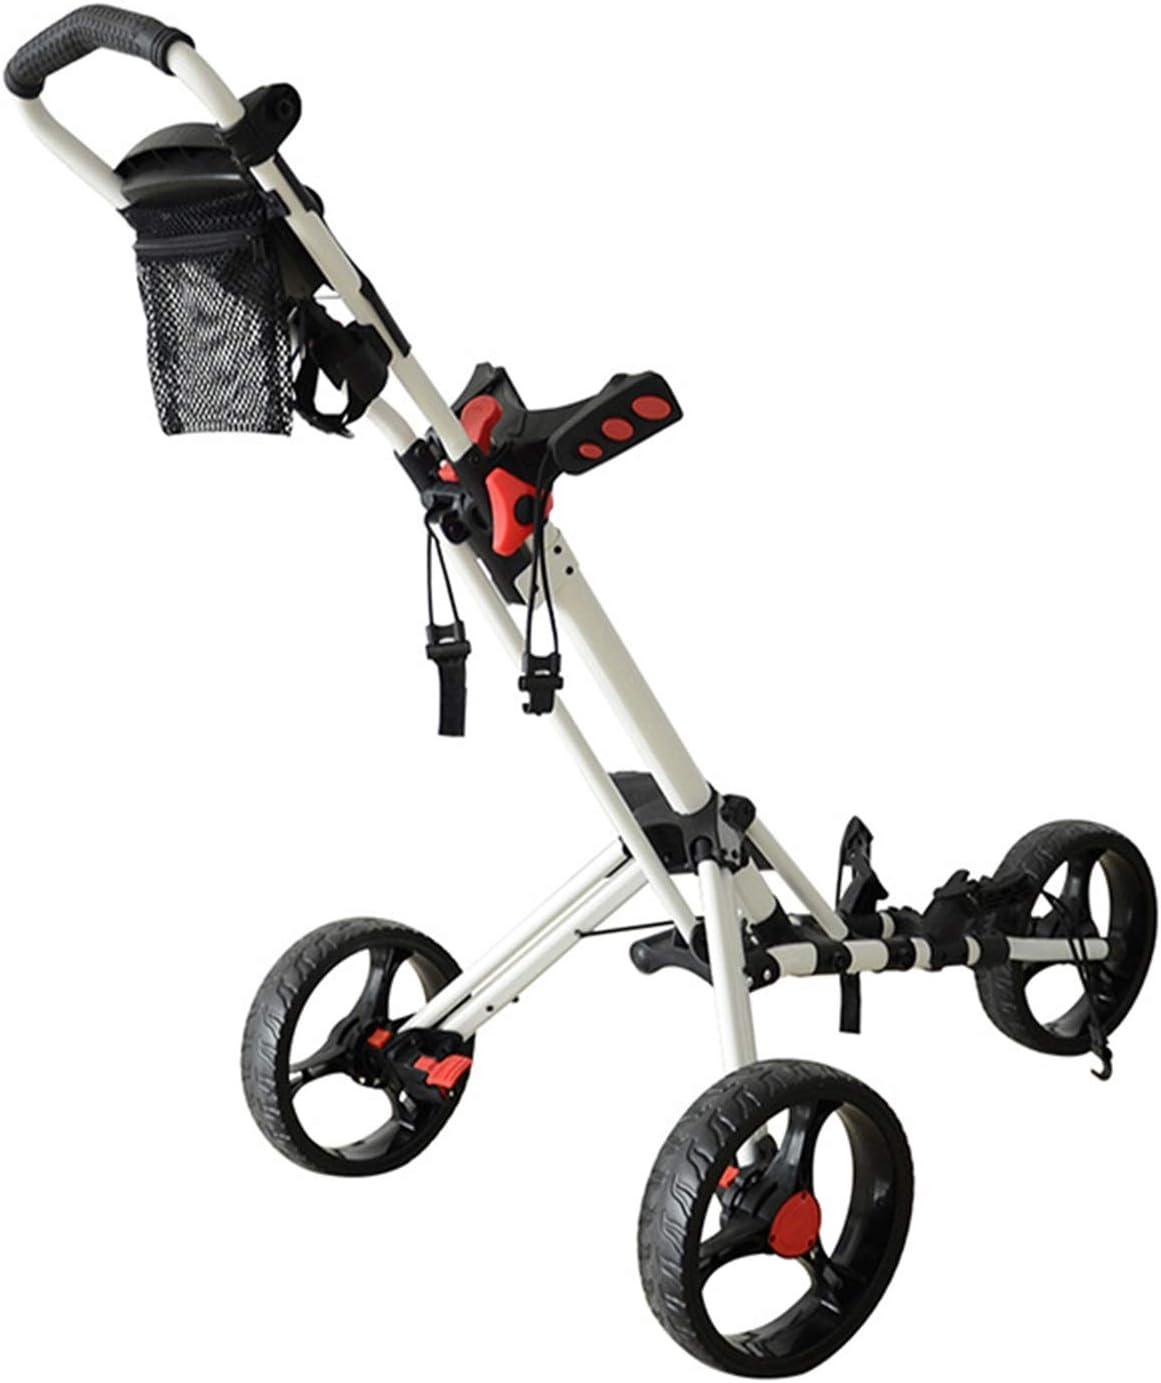 Golf Push Cart 3 Wheels 55% OFF Lightweight Club Folding Store Pull